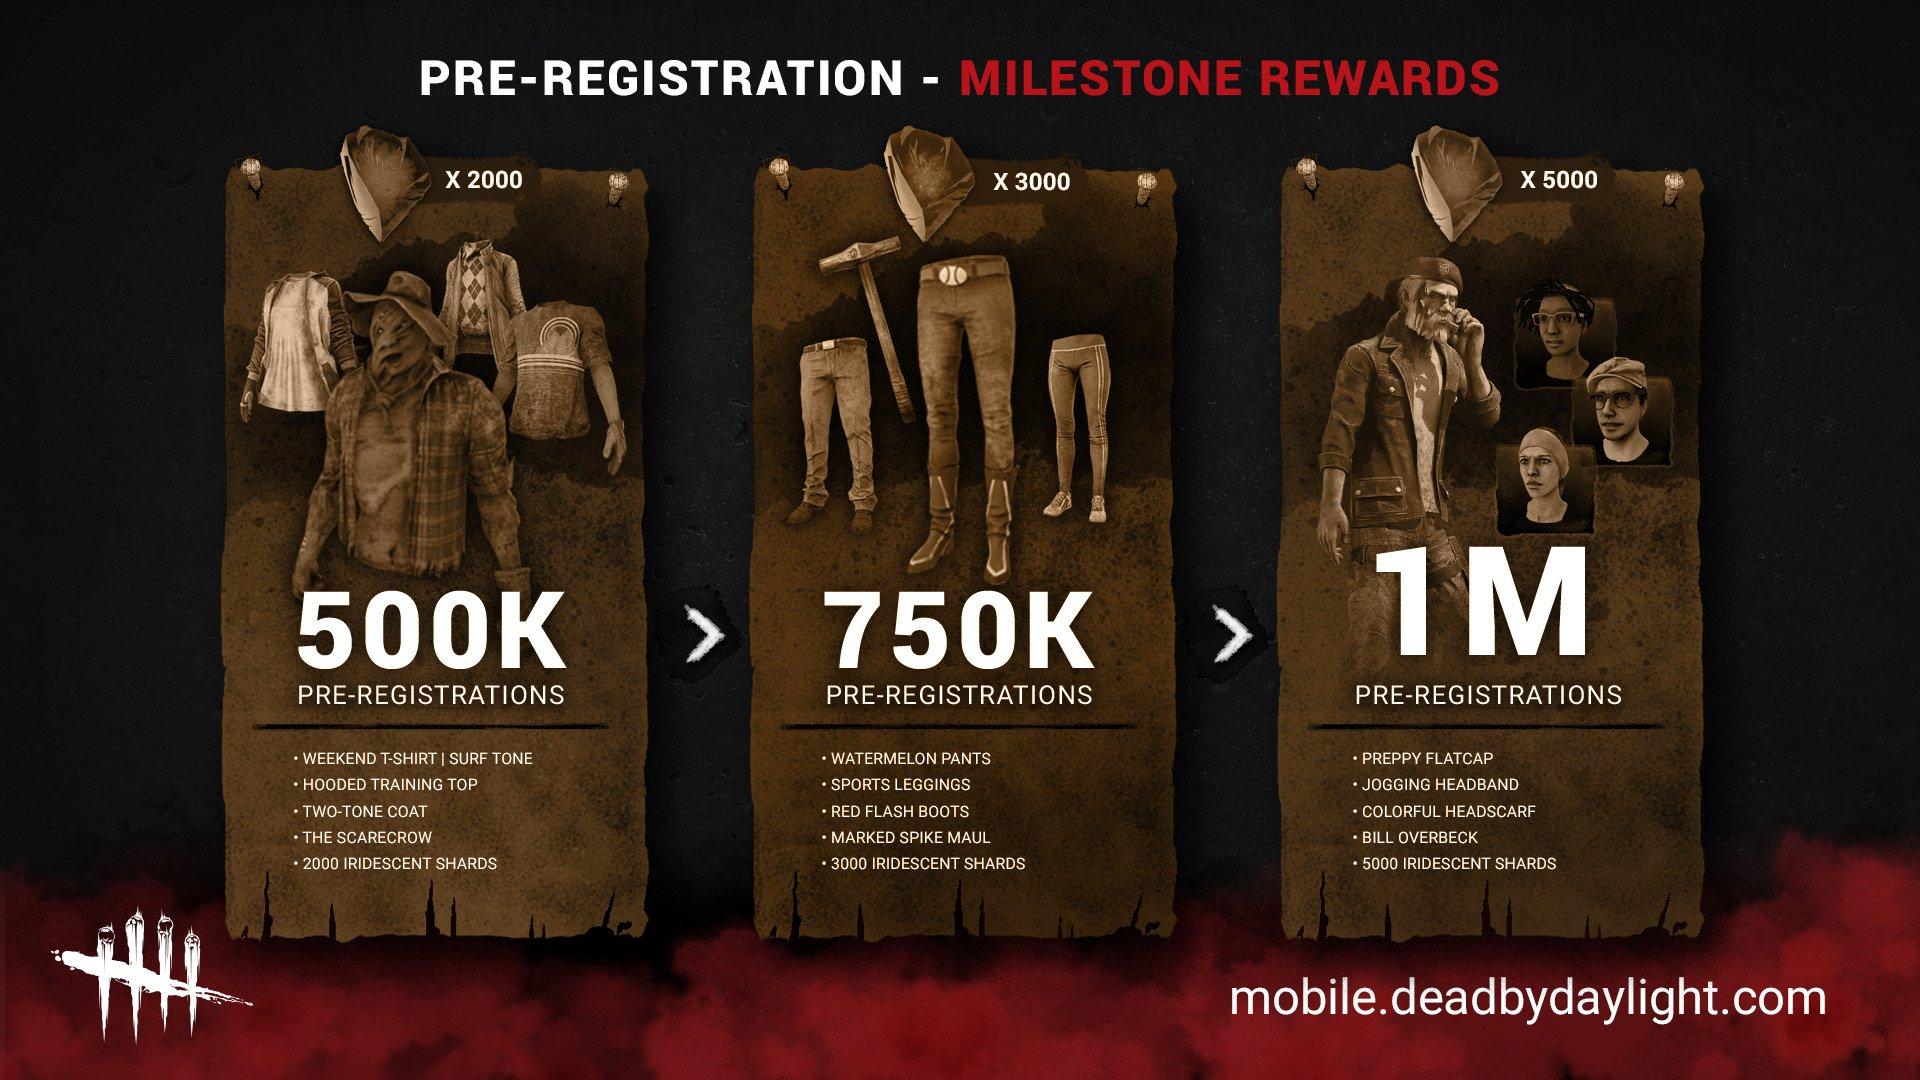 Dead by Daylight Mobile pre-registration rewards